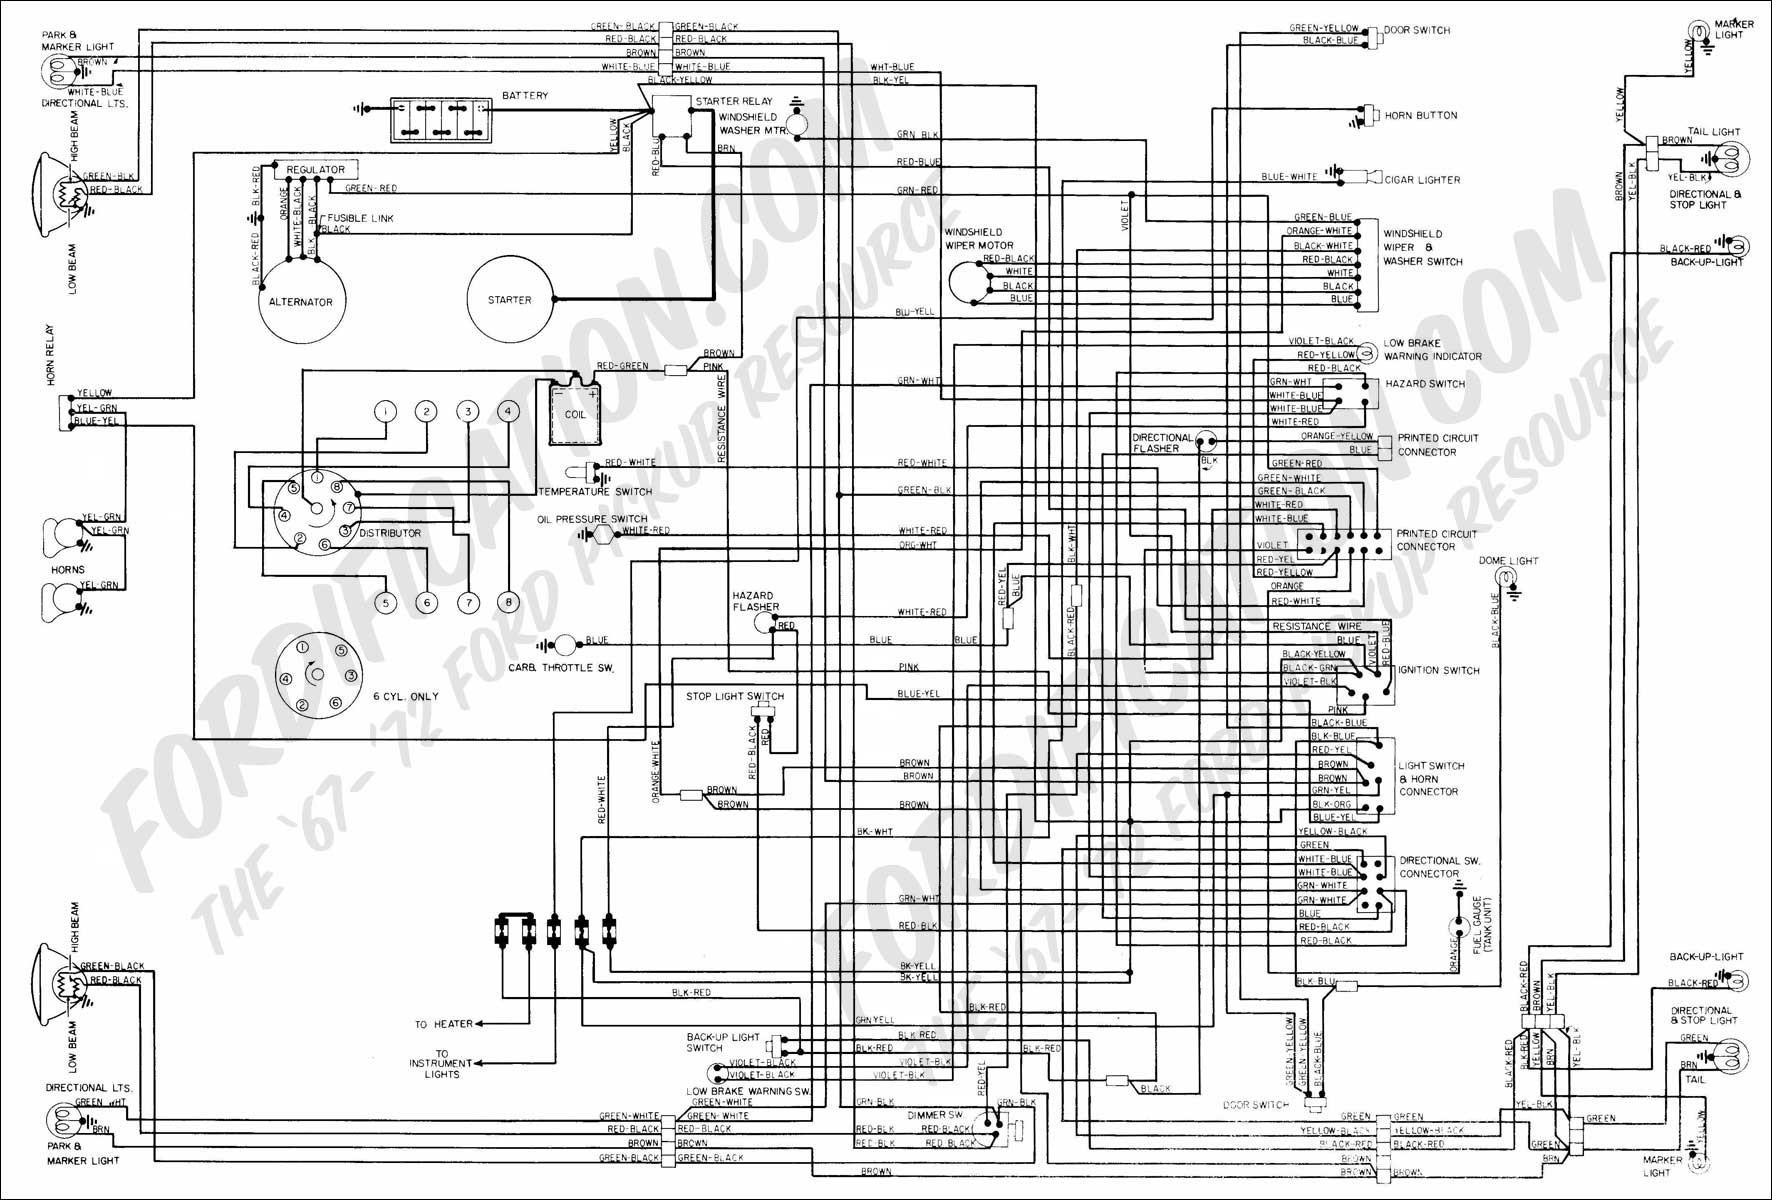 1972 Bronco Alternator Wiring Diagram 1972 ford Regulator Wiring Diagram Of 1972 Bronco Alternator Wiring Diagram